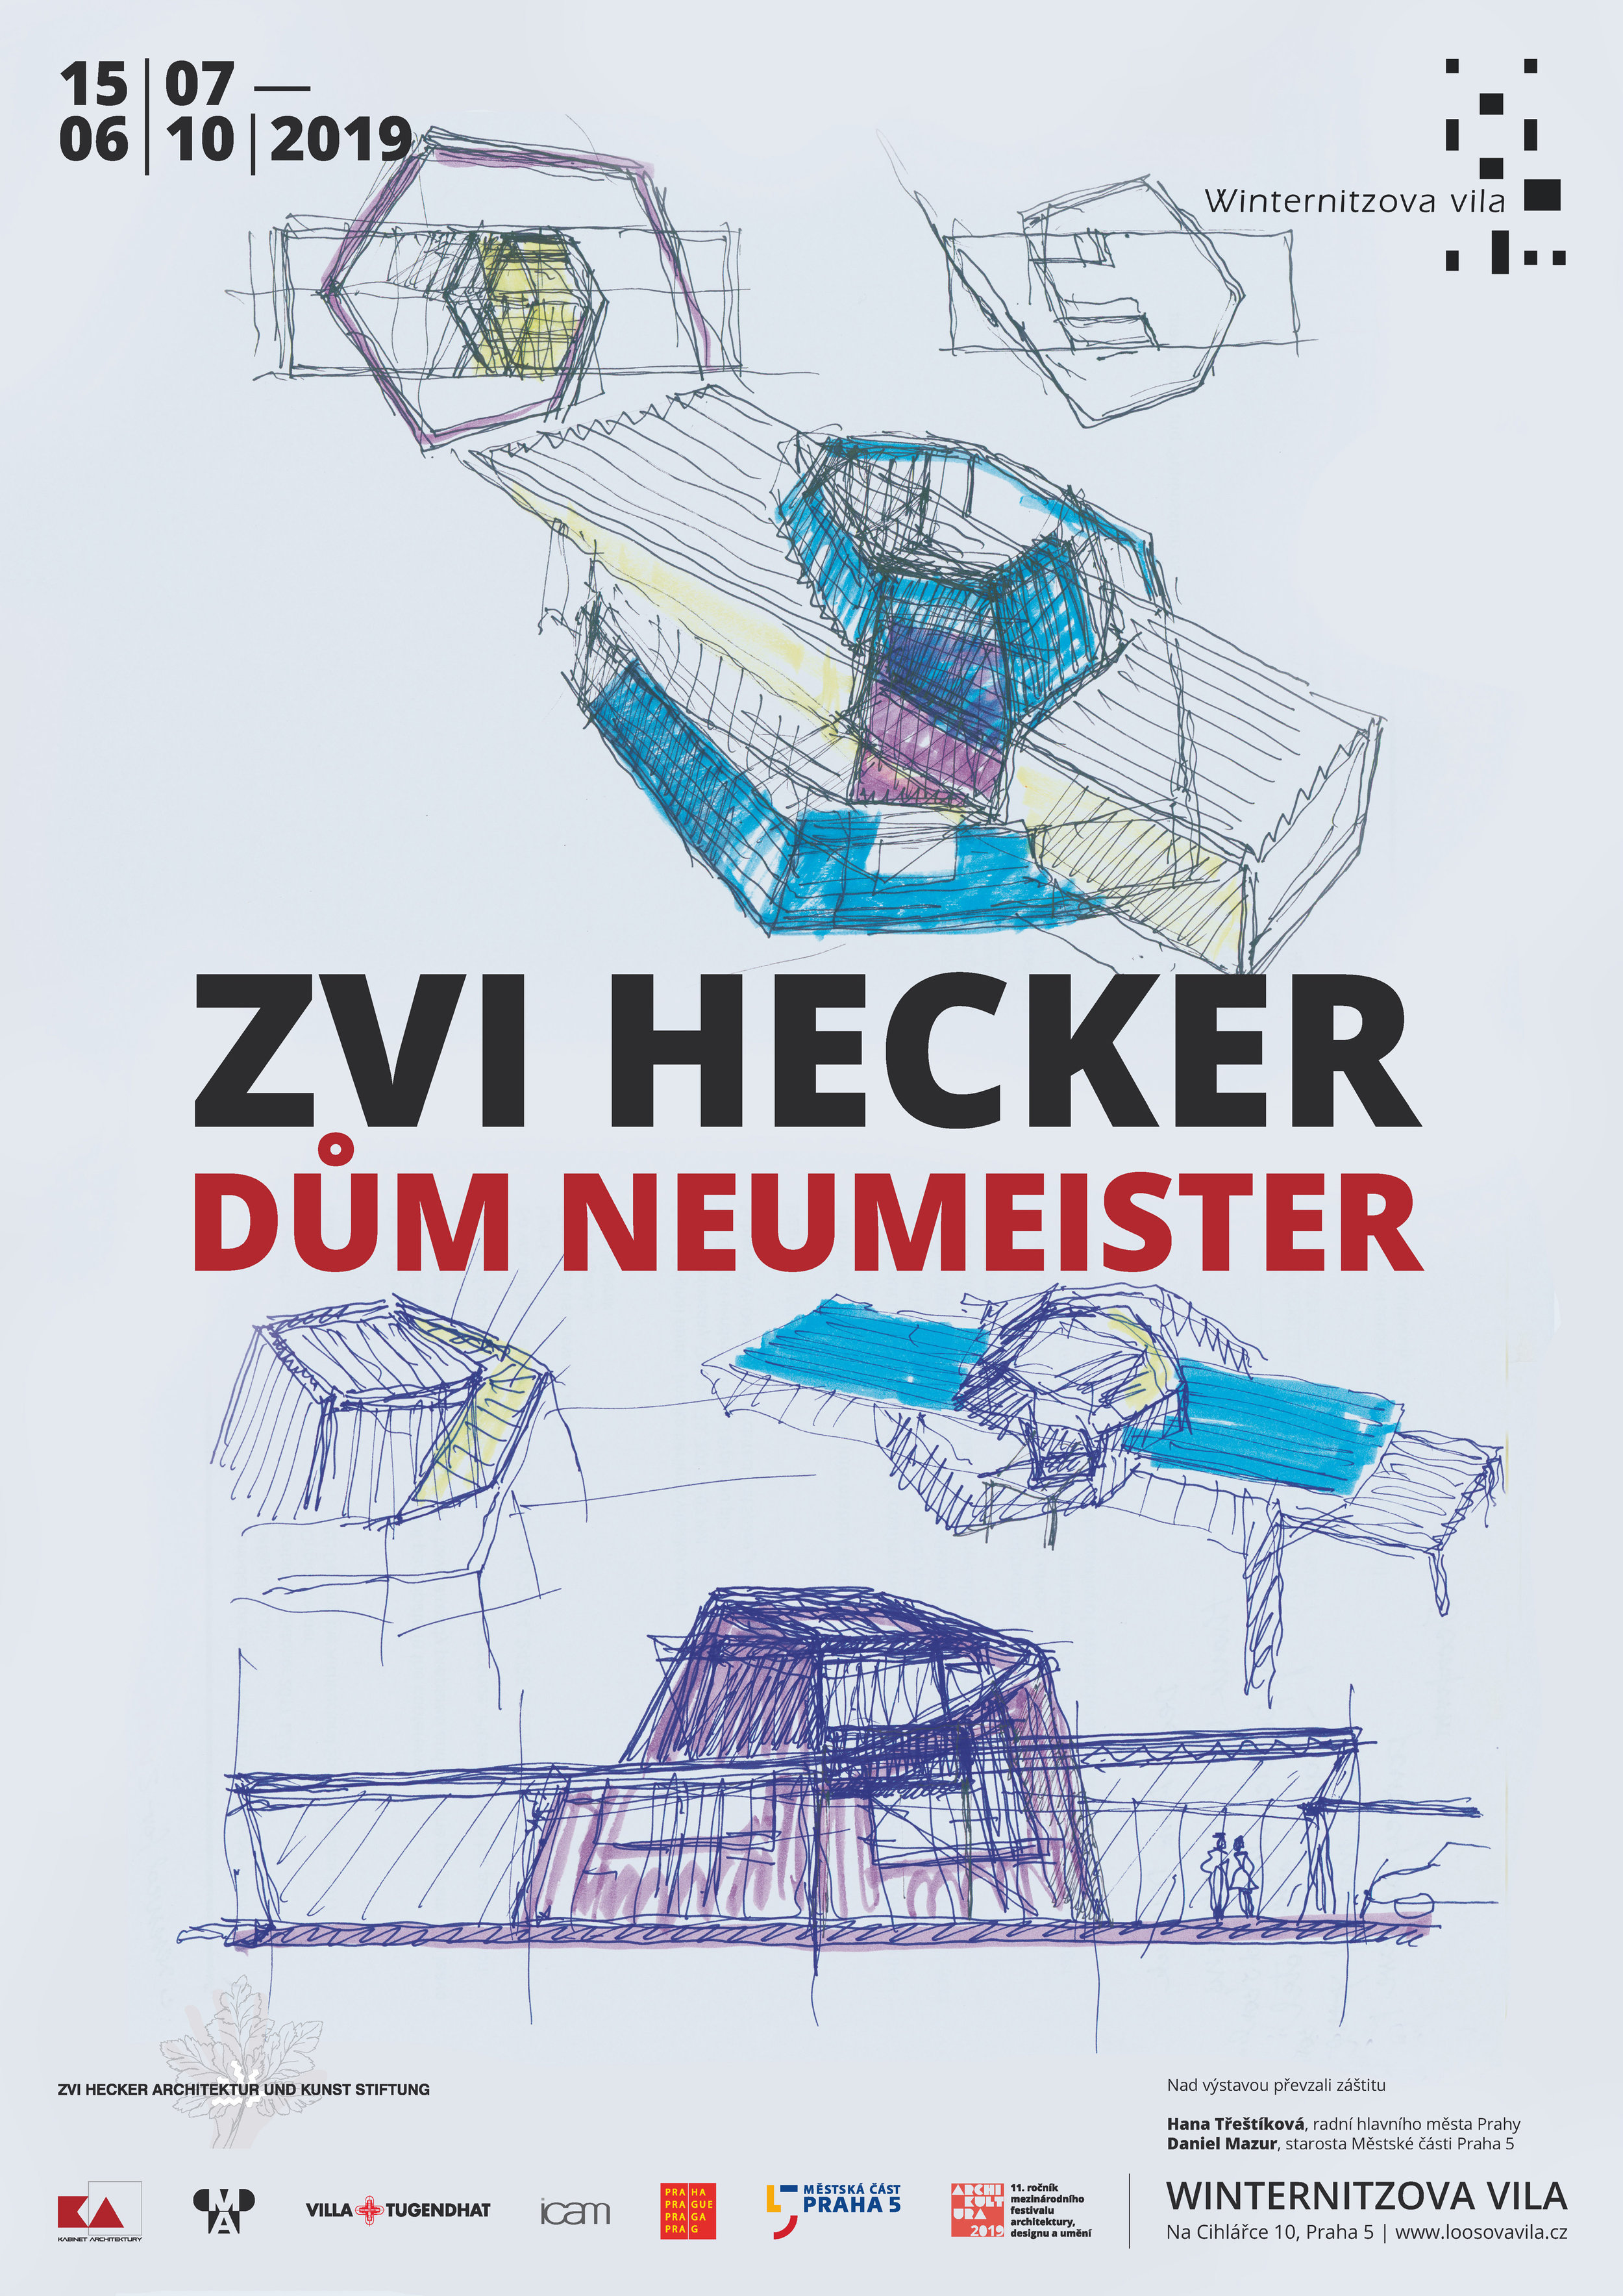 Zvi Hecker exhibition-Villa Winternitz Prague-Kabinet architektury_poster_A2_web.jpg